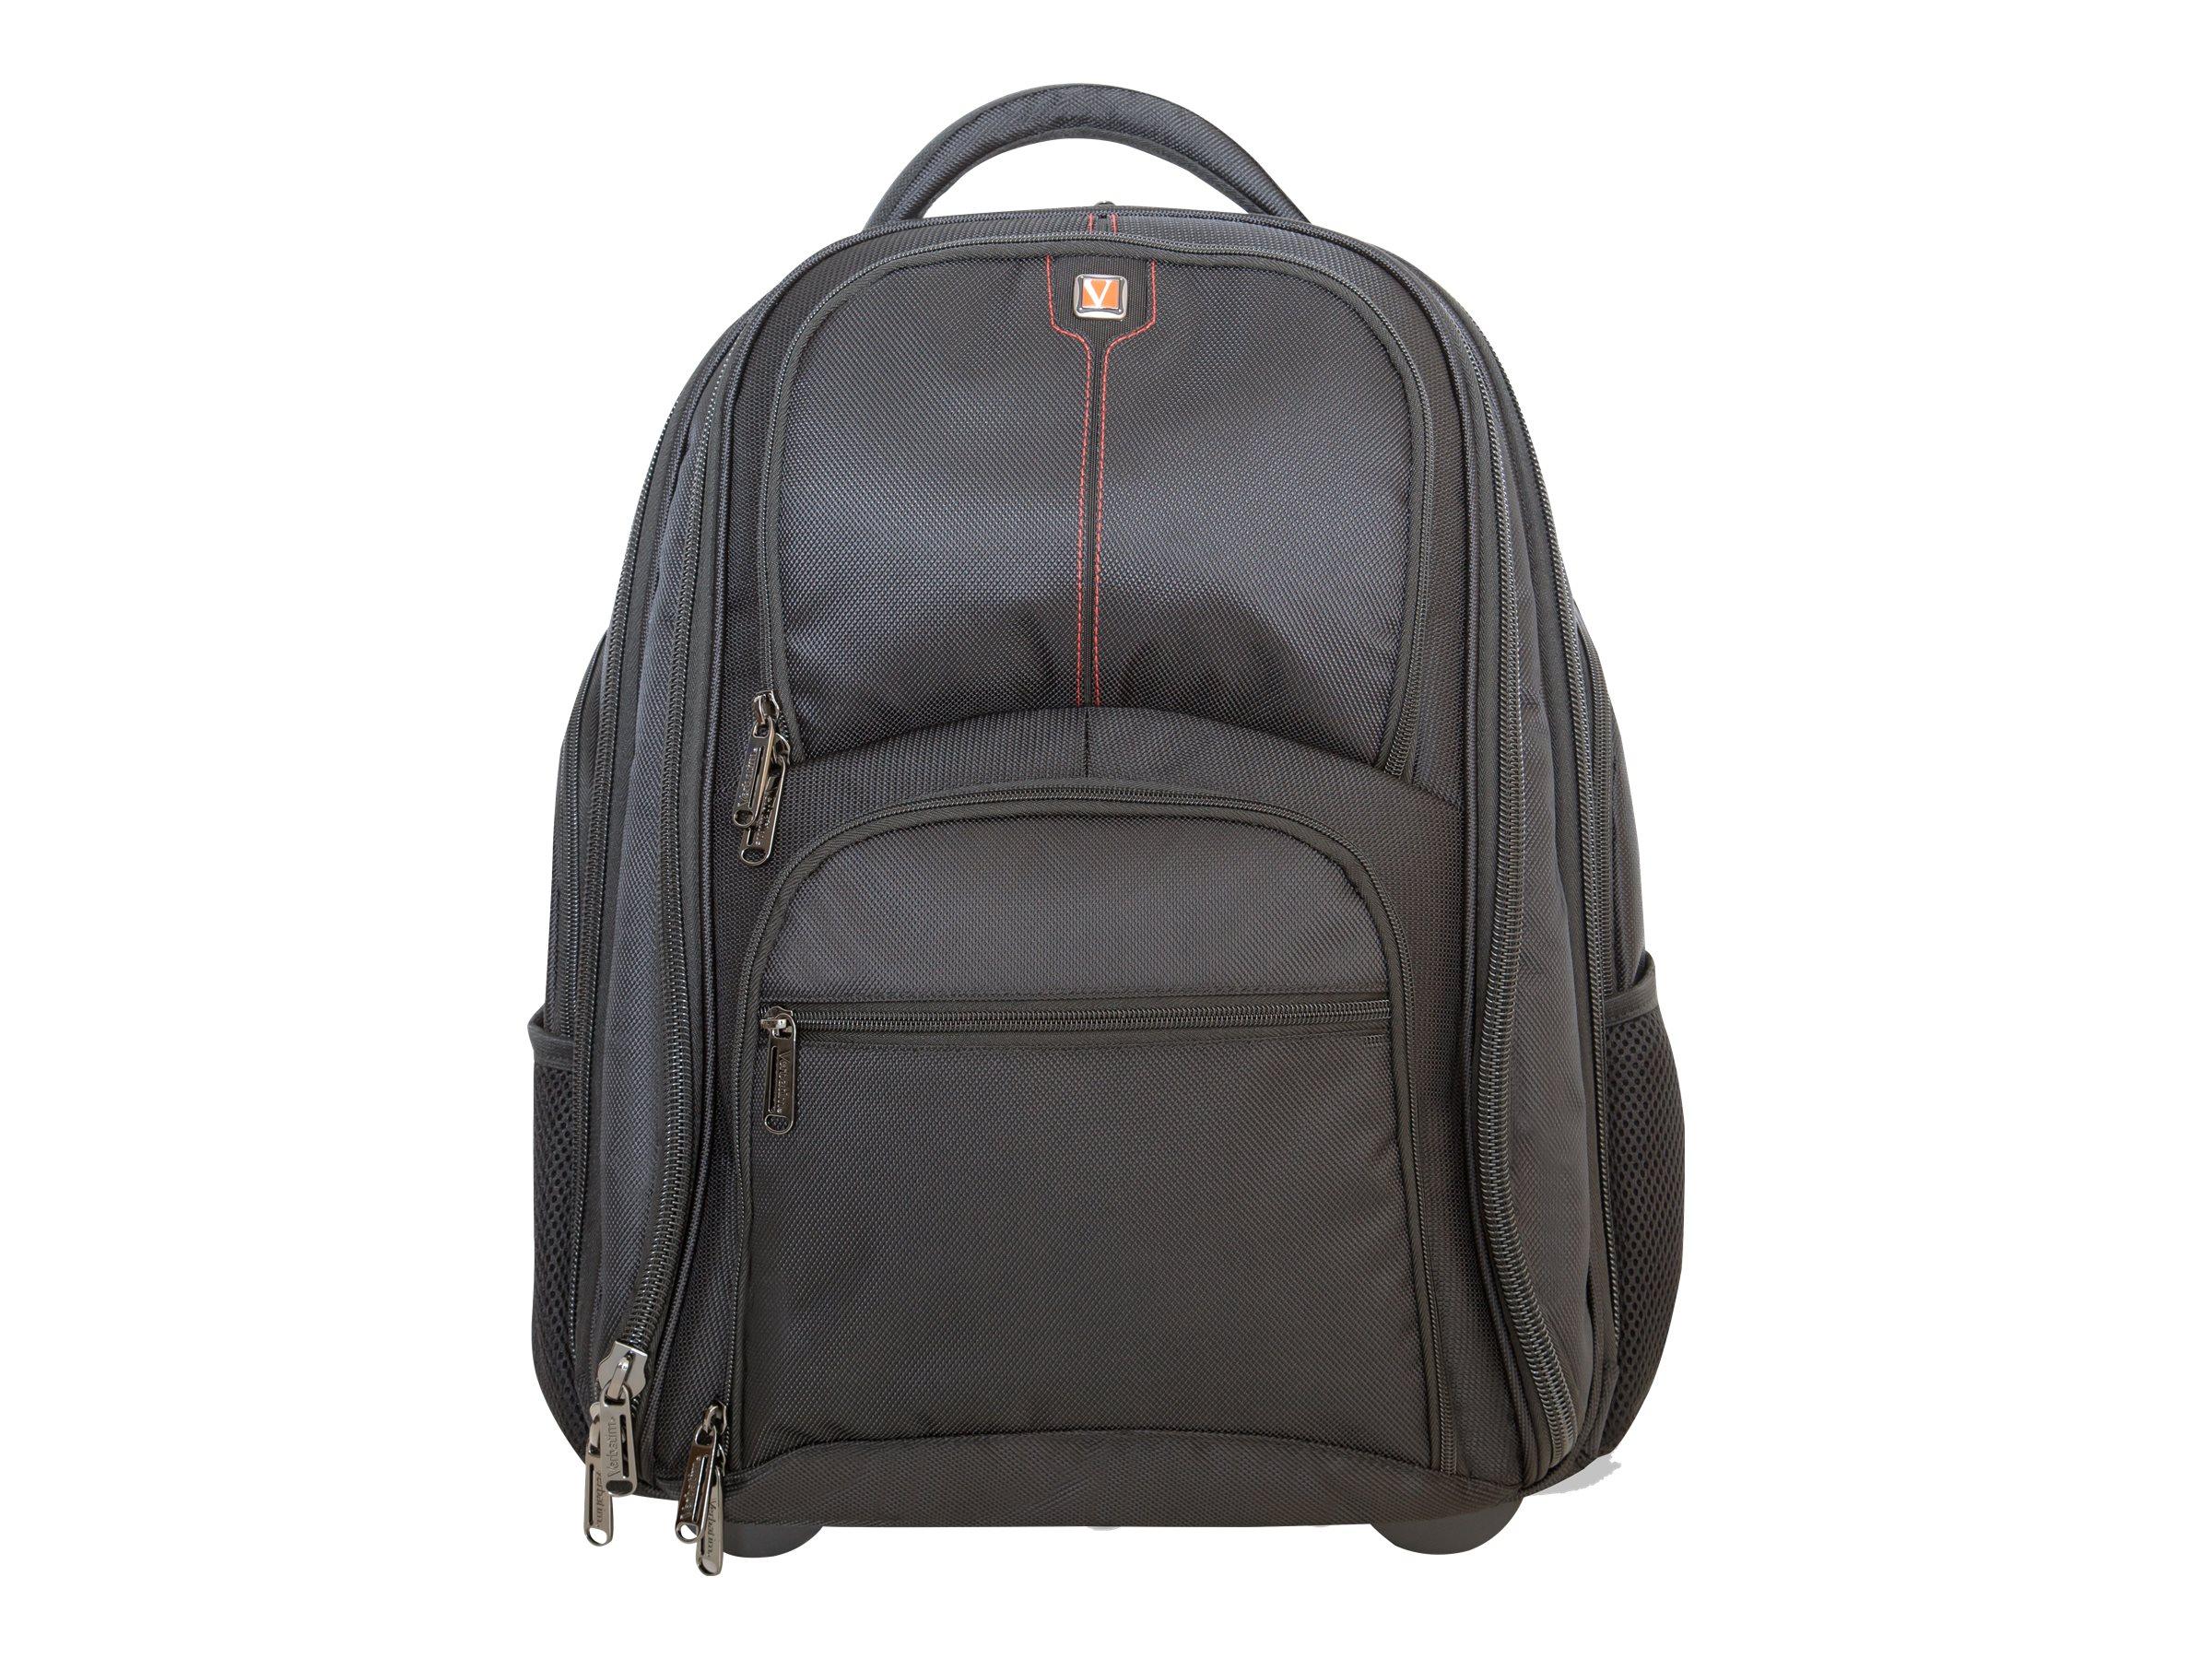 "Verbatim Paris Backpack Roller 17"" - Notebook-Tasche"